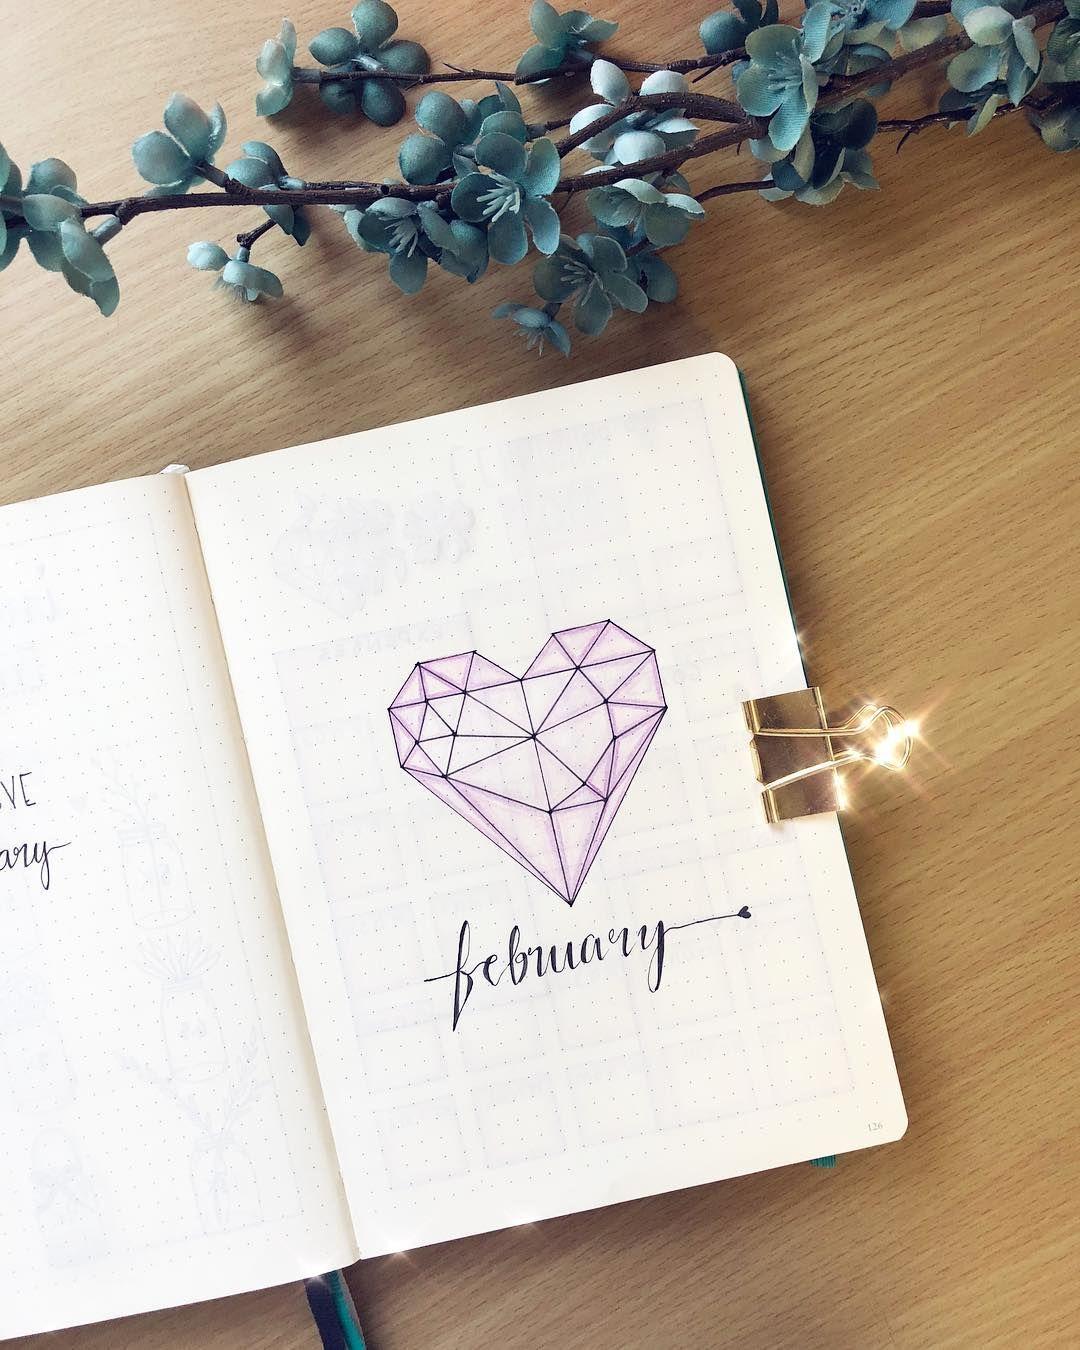 "Gefällt 3,655 Mal, 18 Kommentare - My Little Bullet Journal (@caroline_acebujo) auf Instagram: ""February's cover page ✨"""